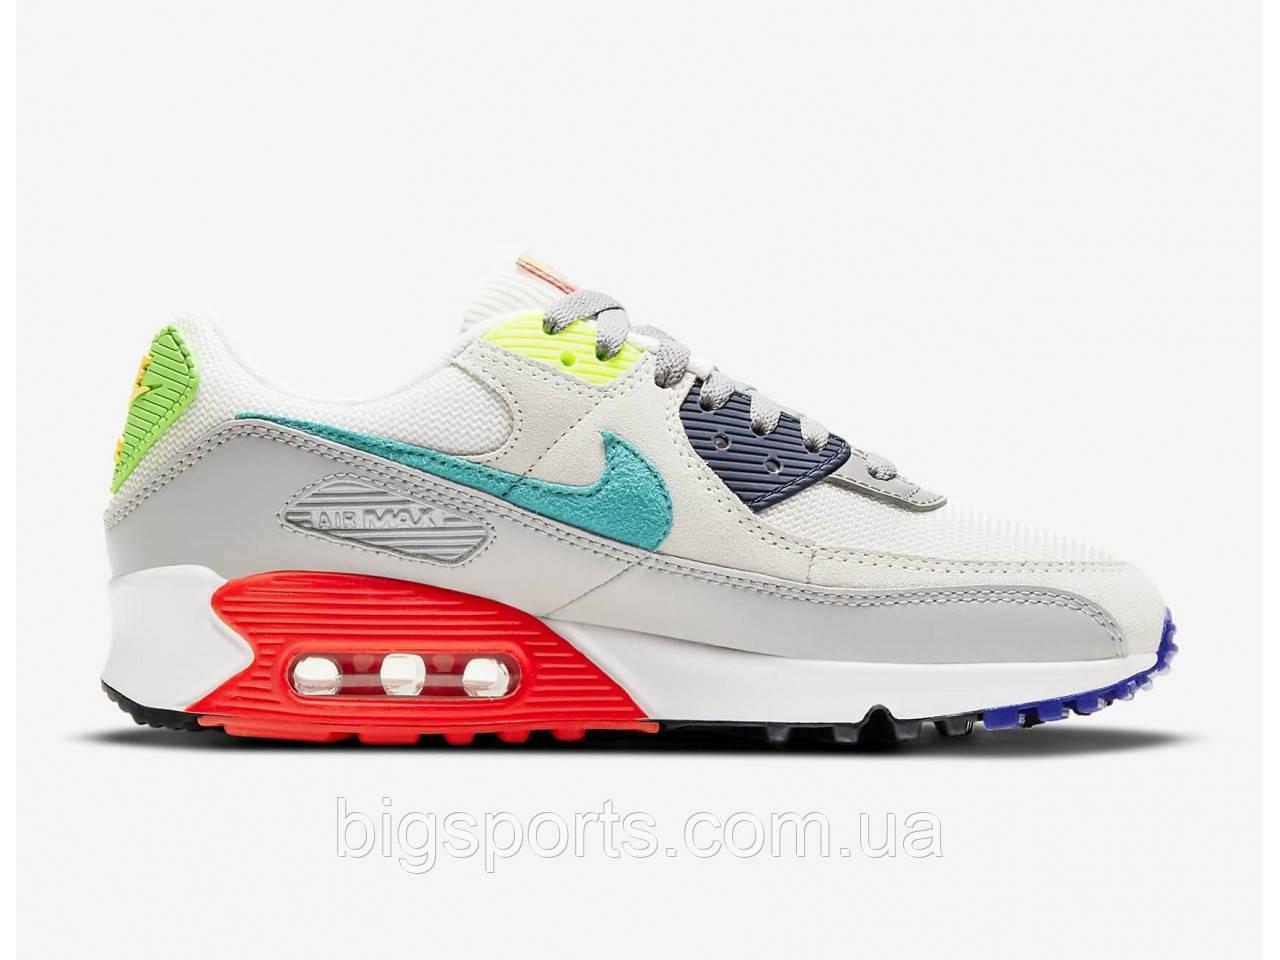 Кроссовки жен. Nike Air Max 90 EOI (арт. DD1500-001)